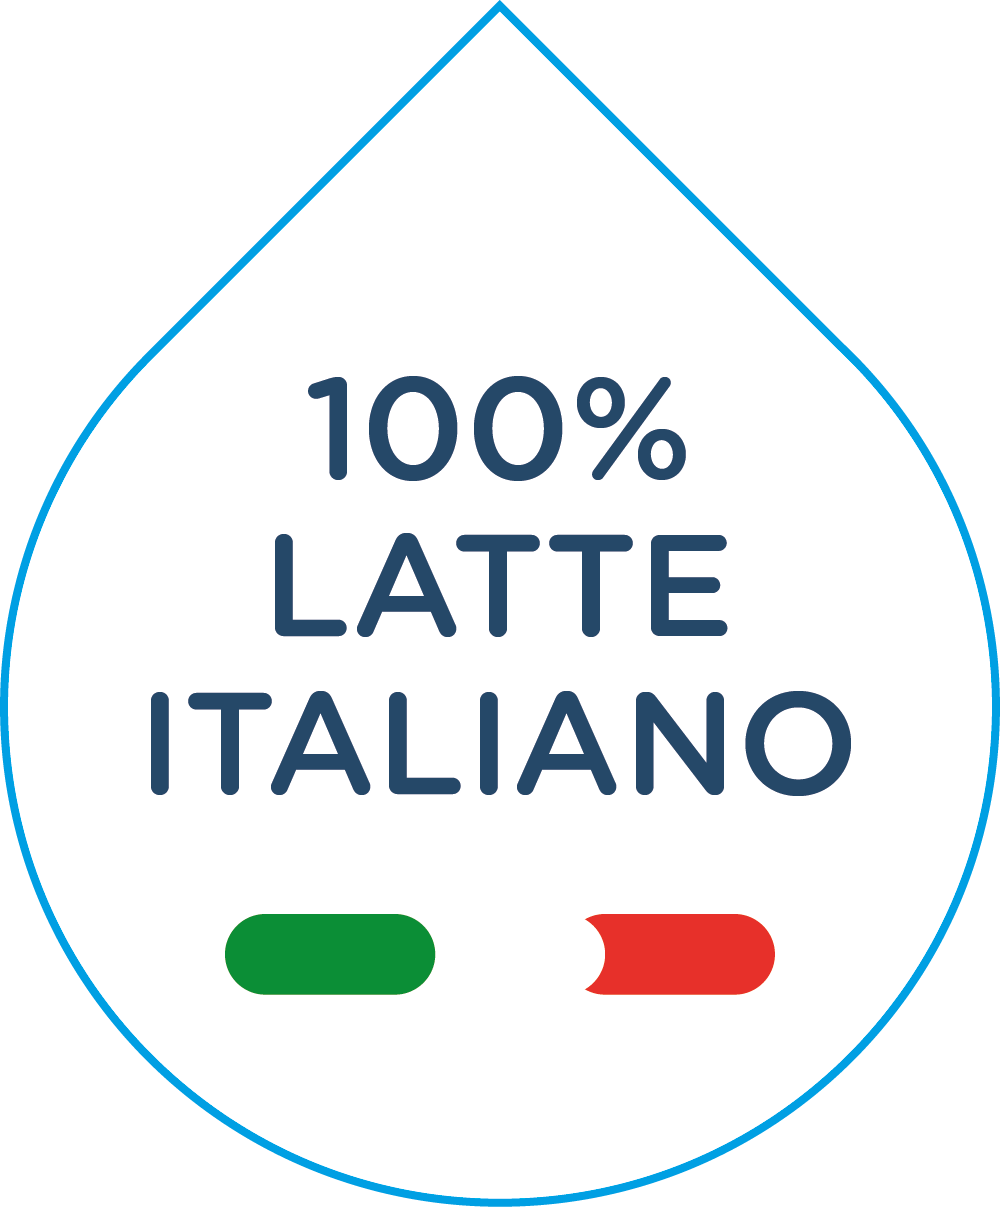 vero latte italiano